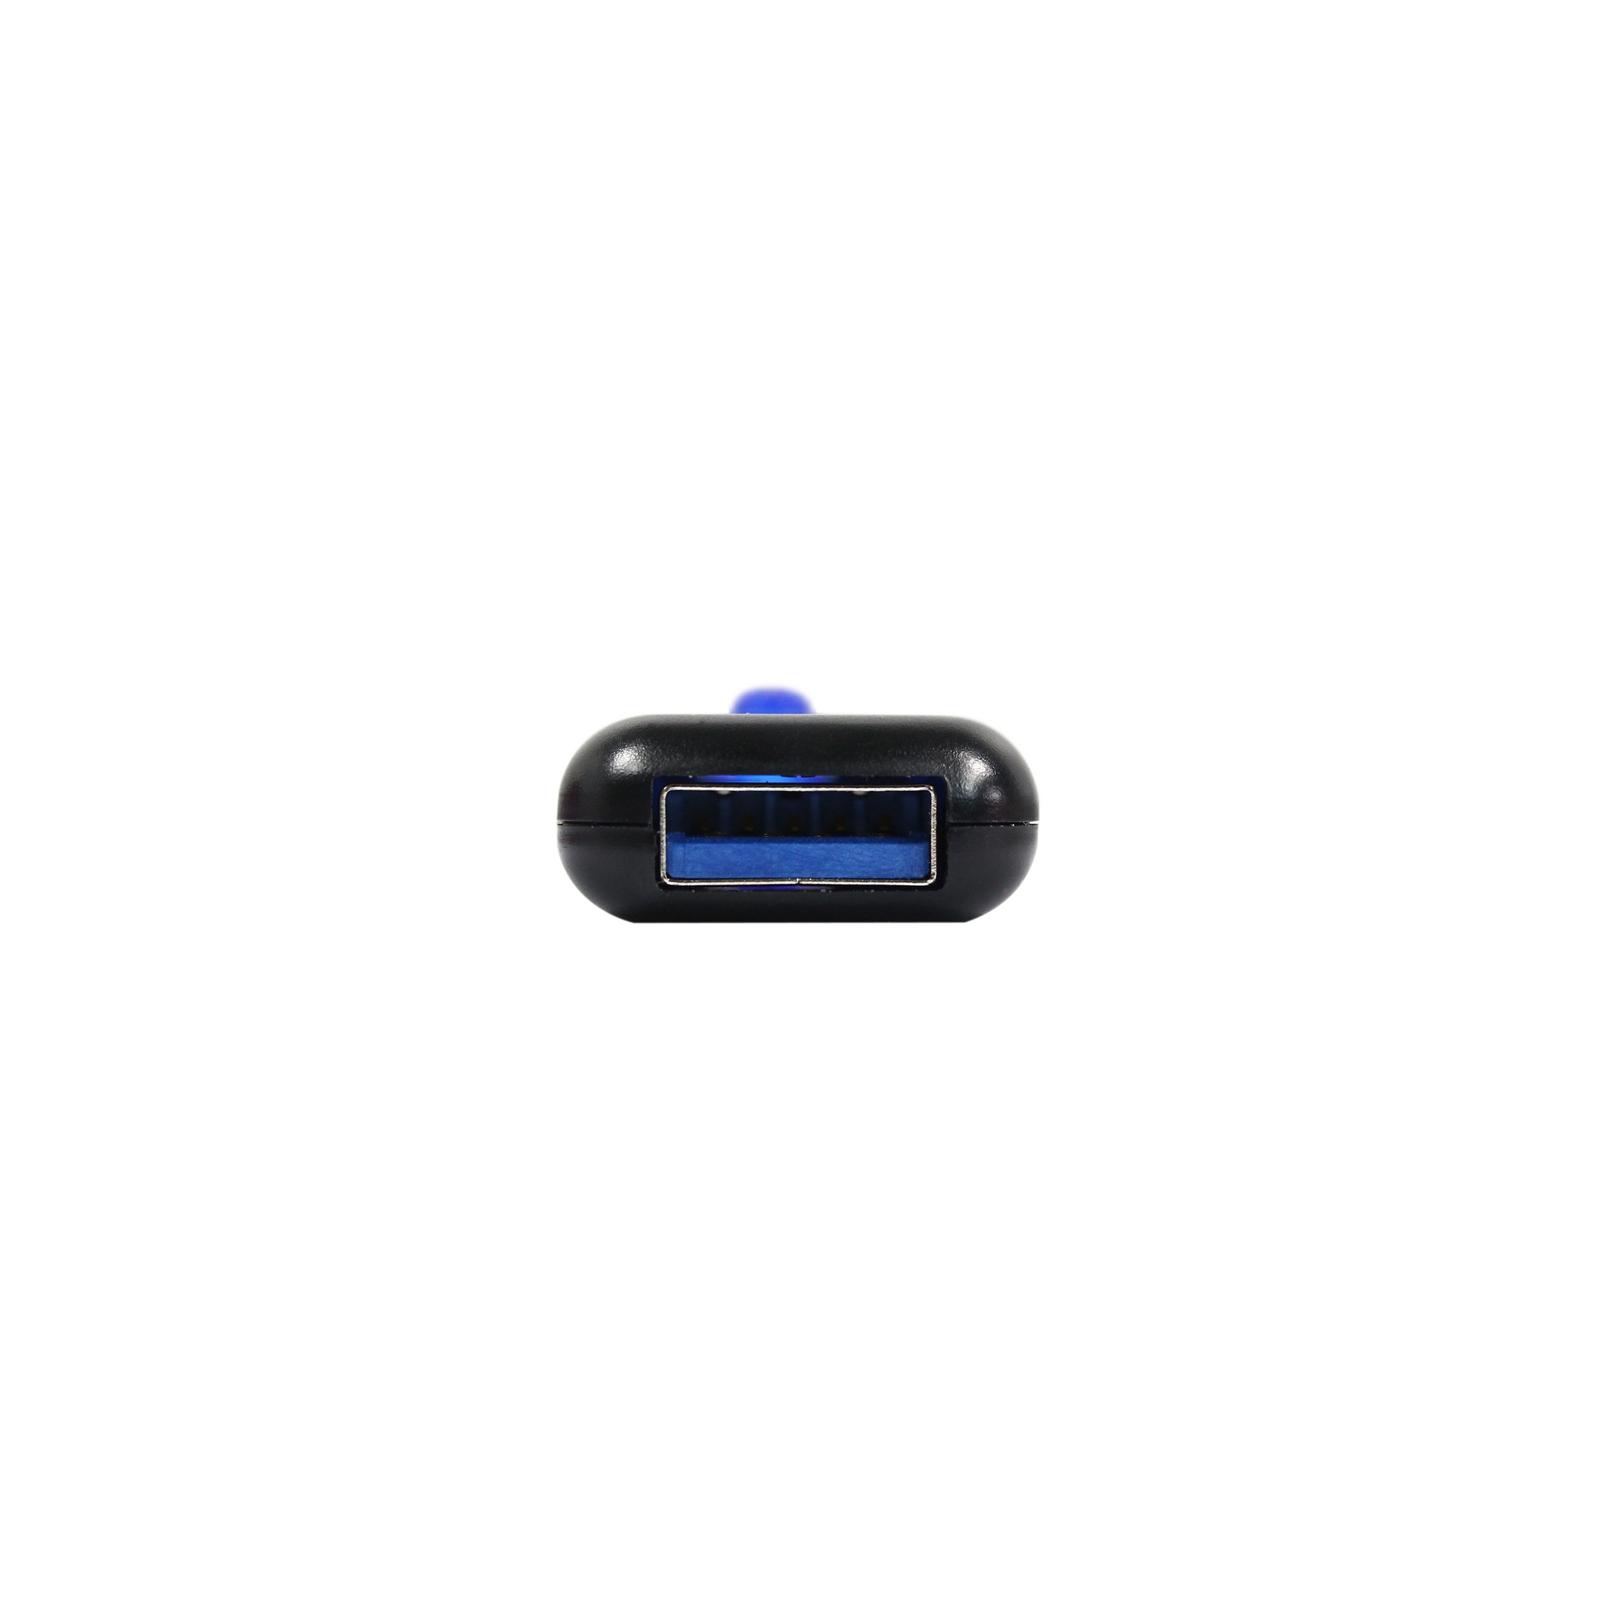 USB флеш накопитель 32GB AH354 Black RP USB3.0 Apacer (AP32GAH354B-1) изображение 7